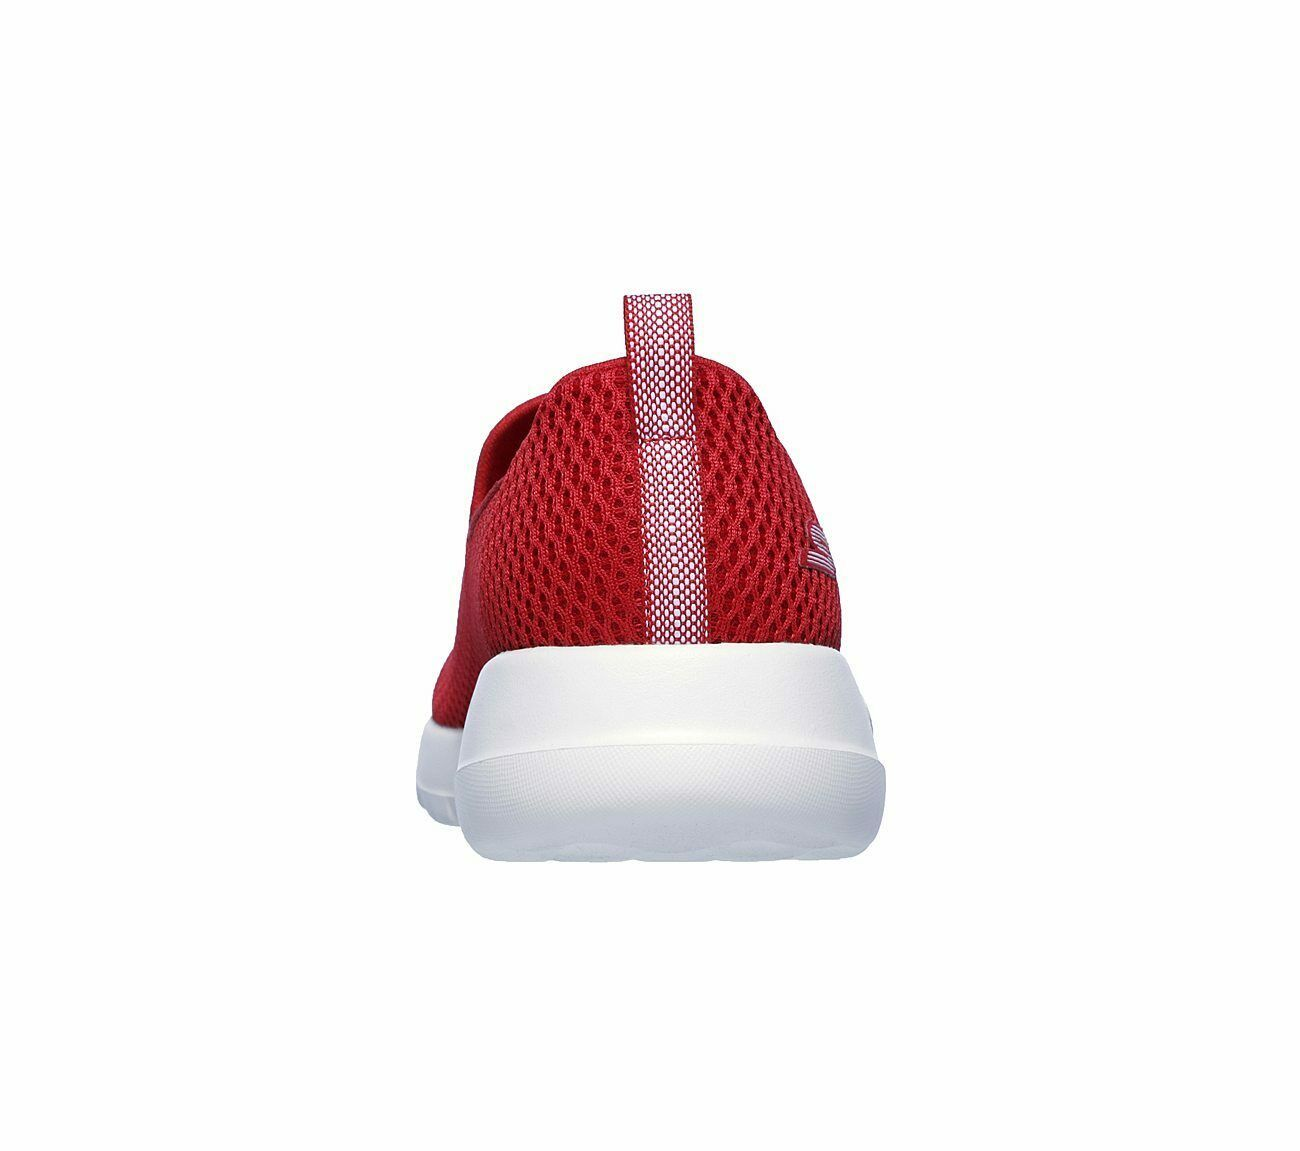 Skechers Shoes Red Go Walk Joy Women Sport Soft Casual Slipon Comfort Mesh 15600 image 6